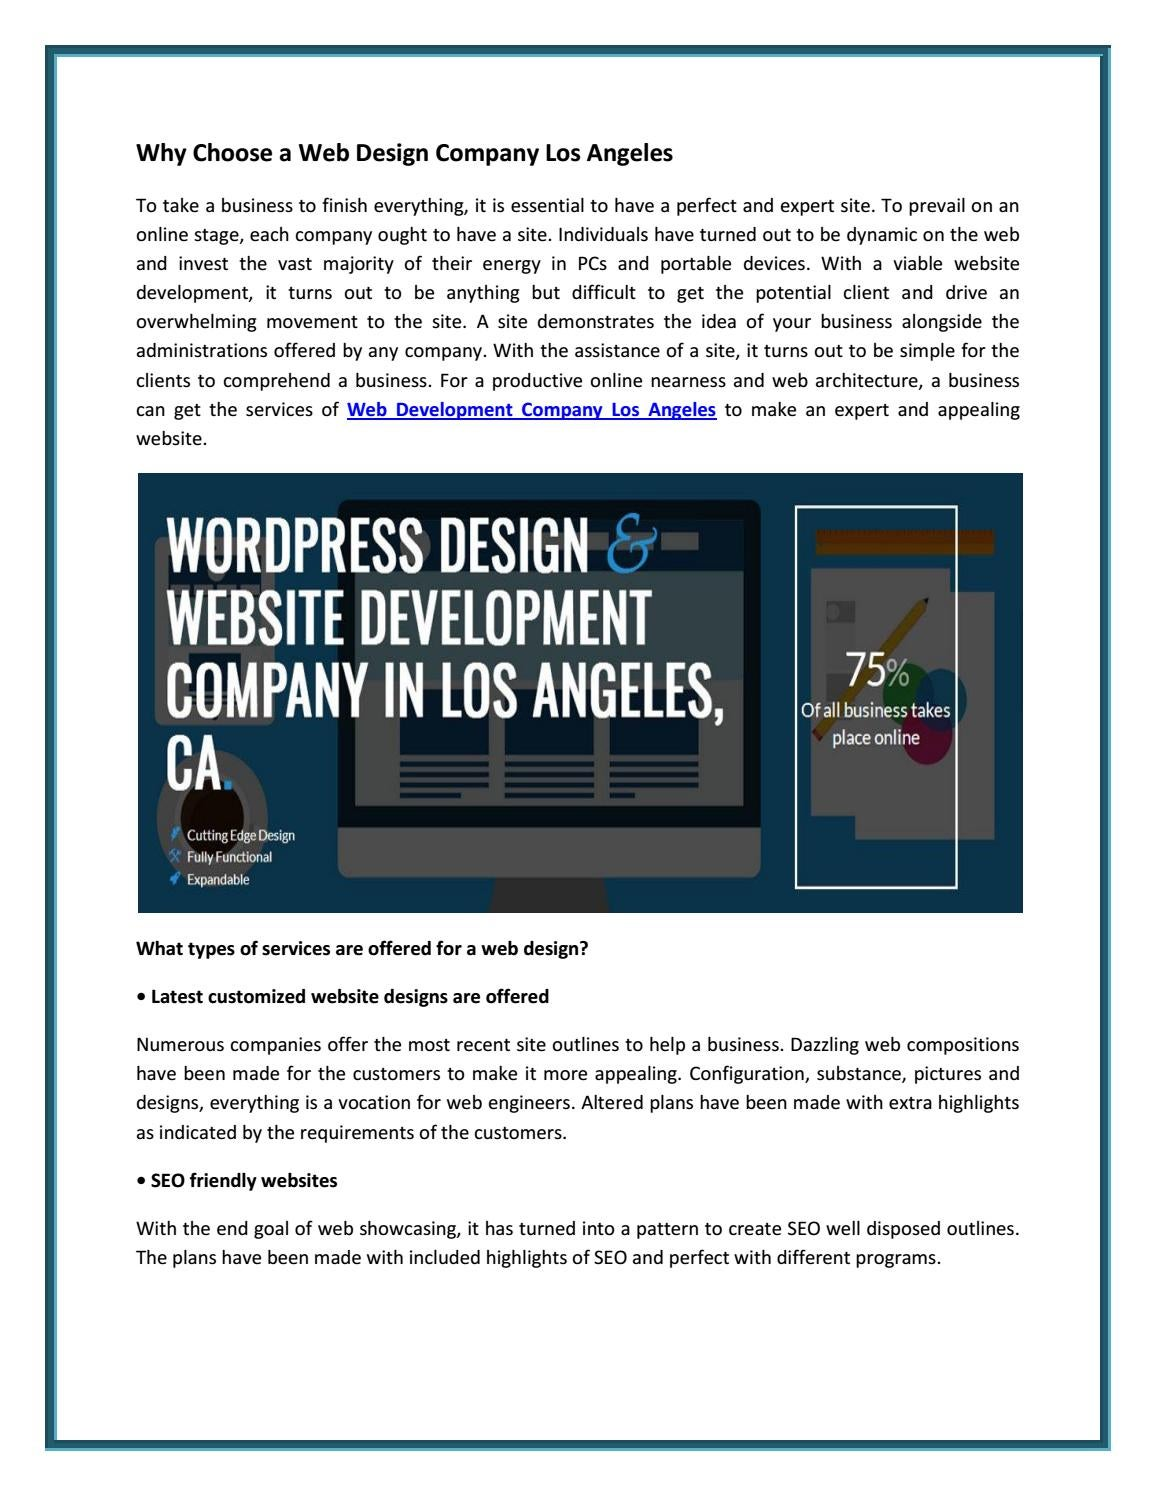 Web Design Company Los Angeles Ca By Digni Soft Issuu